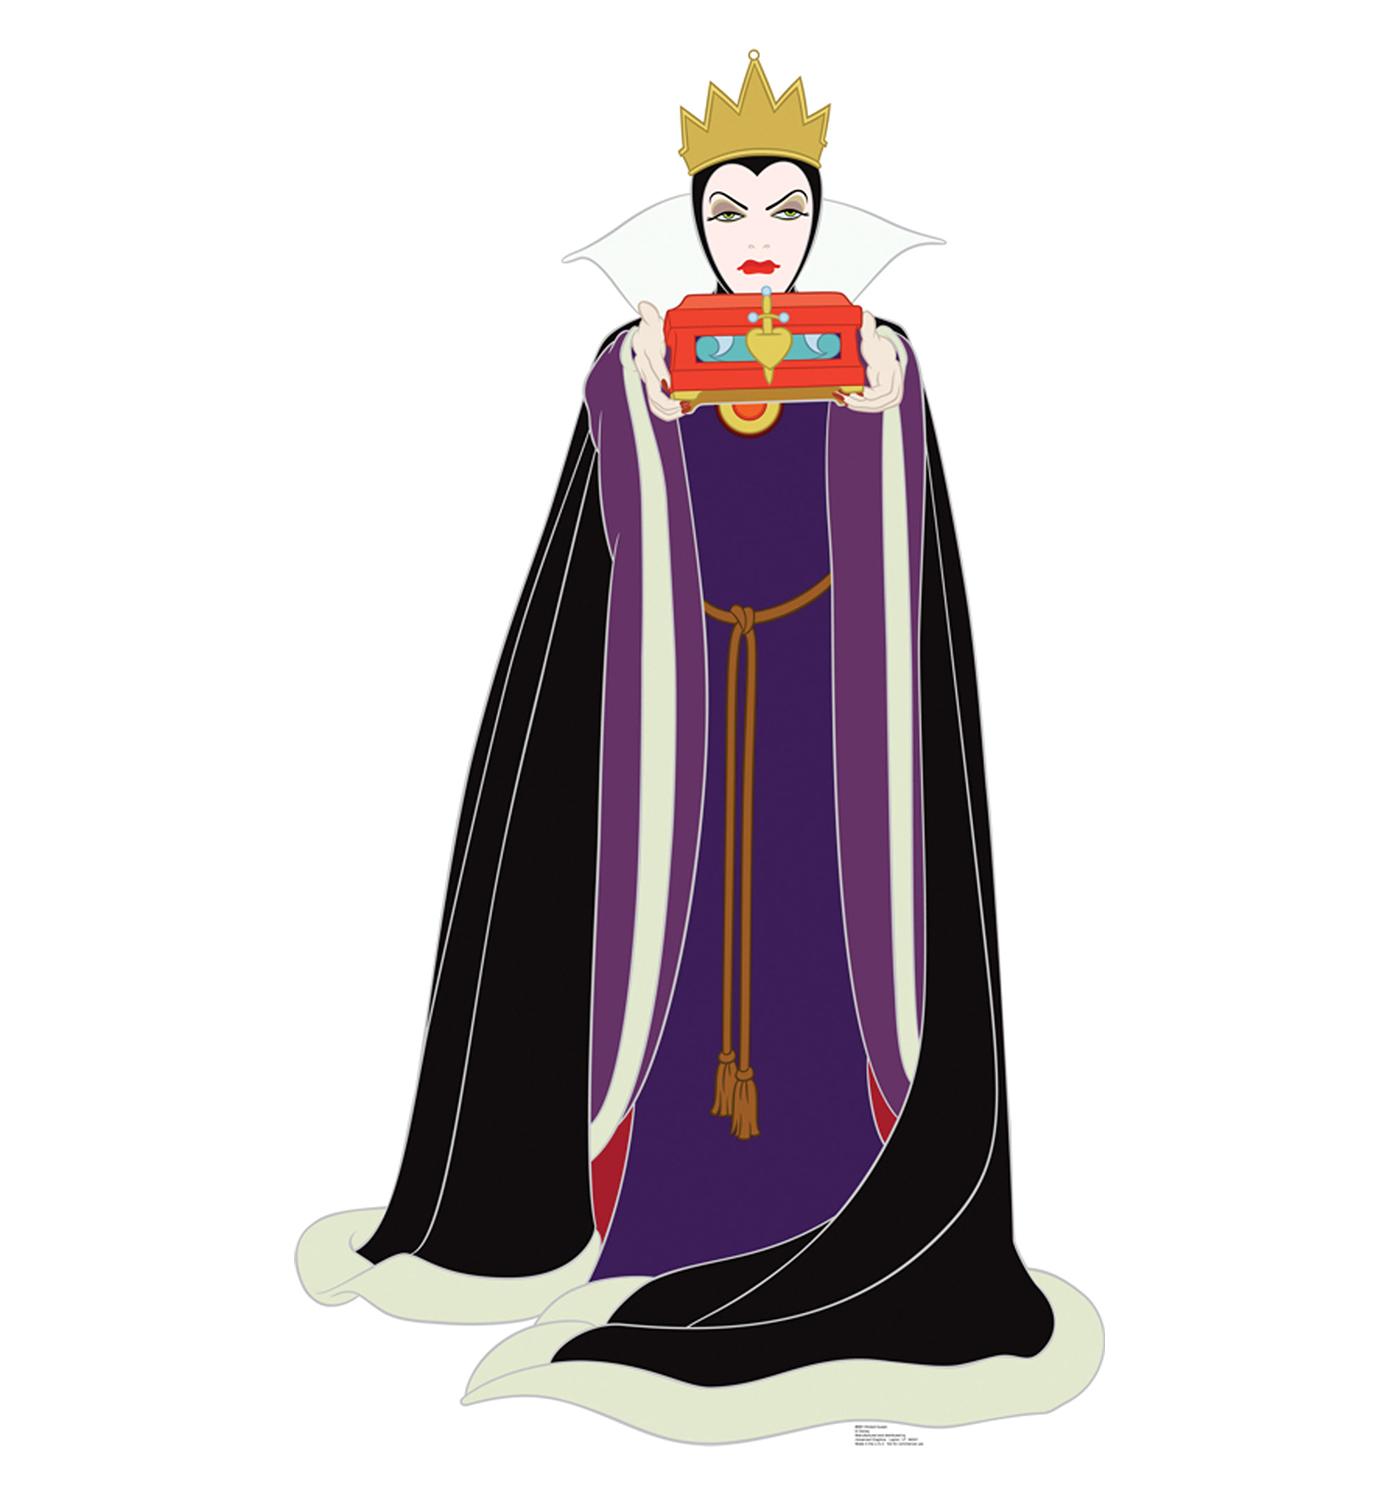 evil queen clipart silhouette 20 free Cliparts | Download ...Disney Evil Queen Art